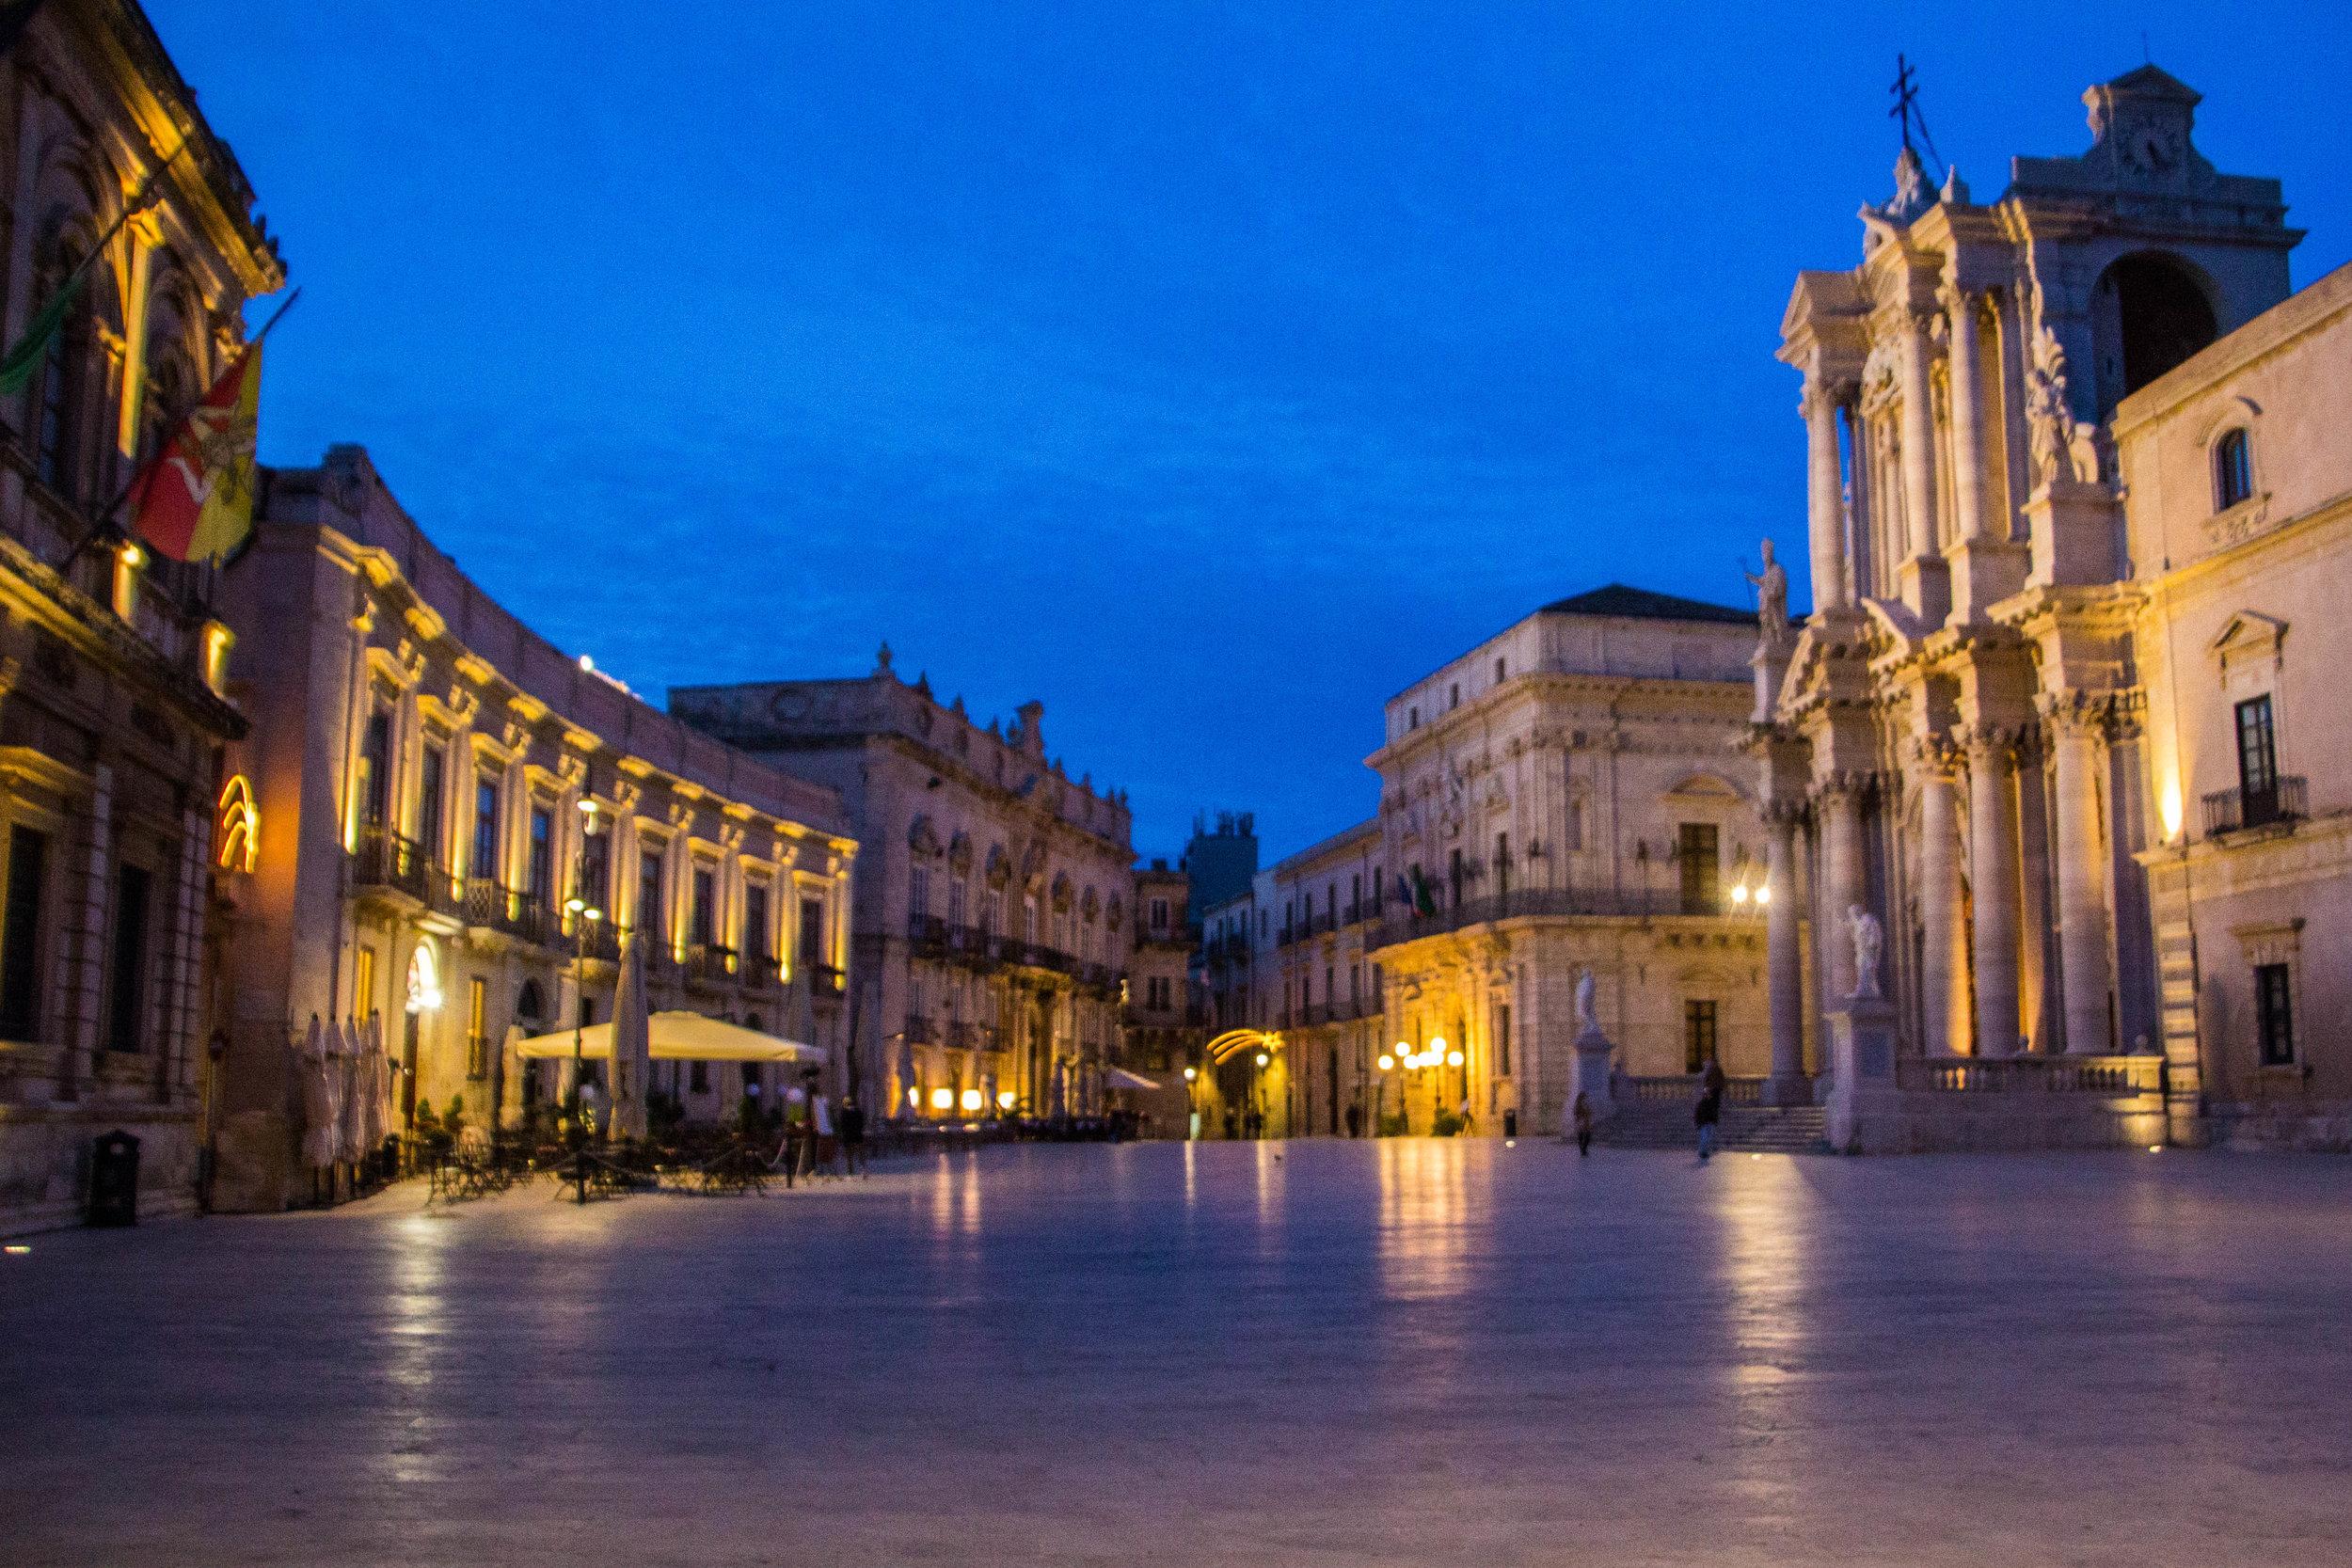 piazza-duomo-sunset-ortigya-syracuse-sicily-32.jpg